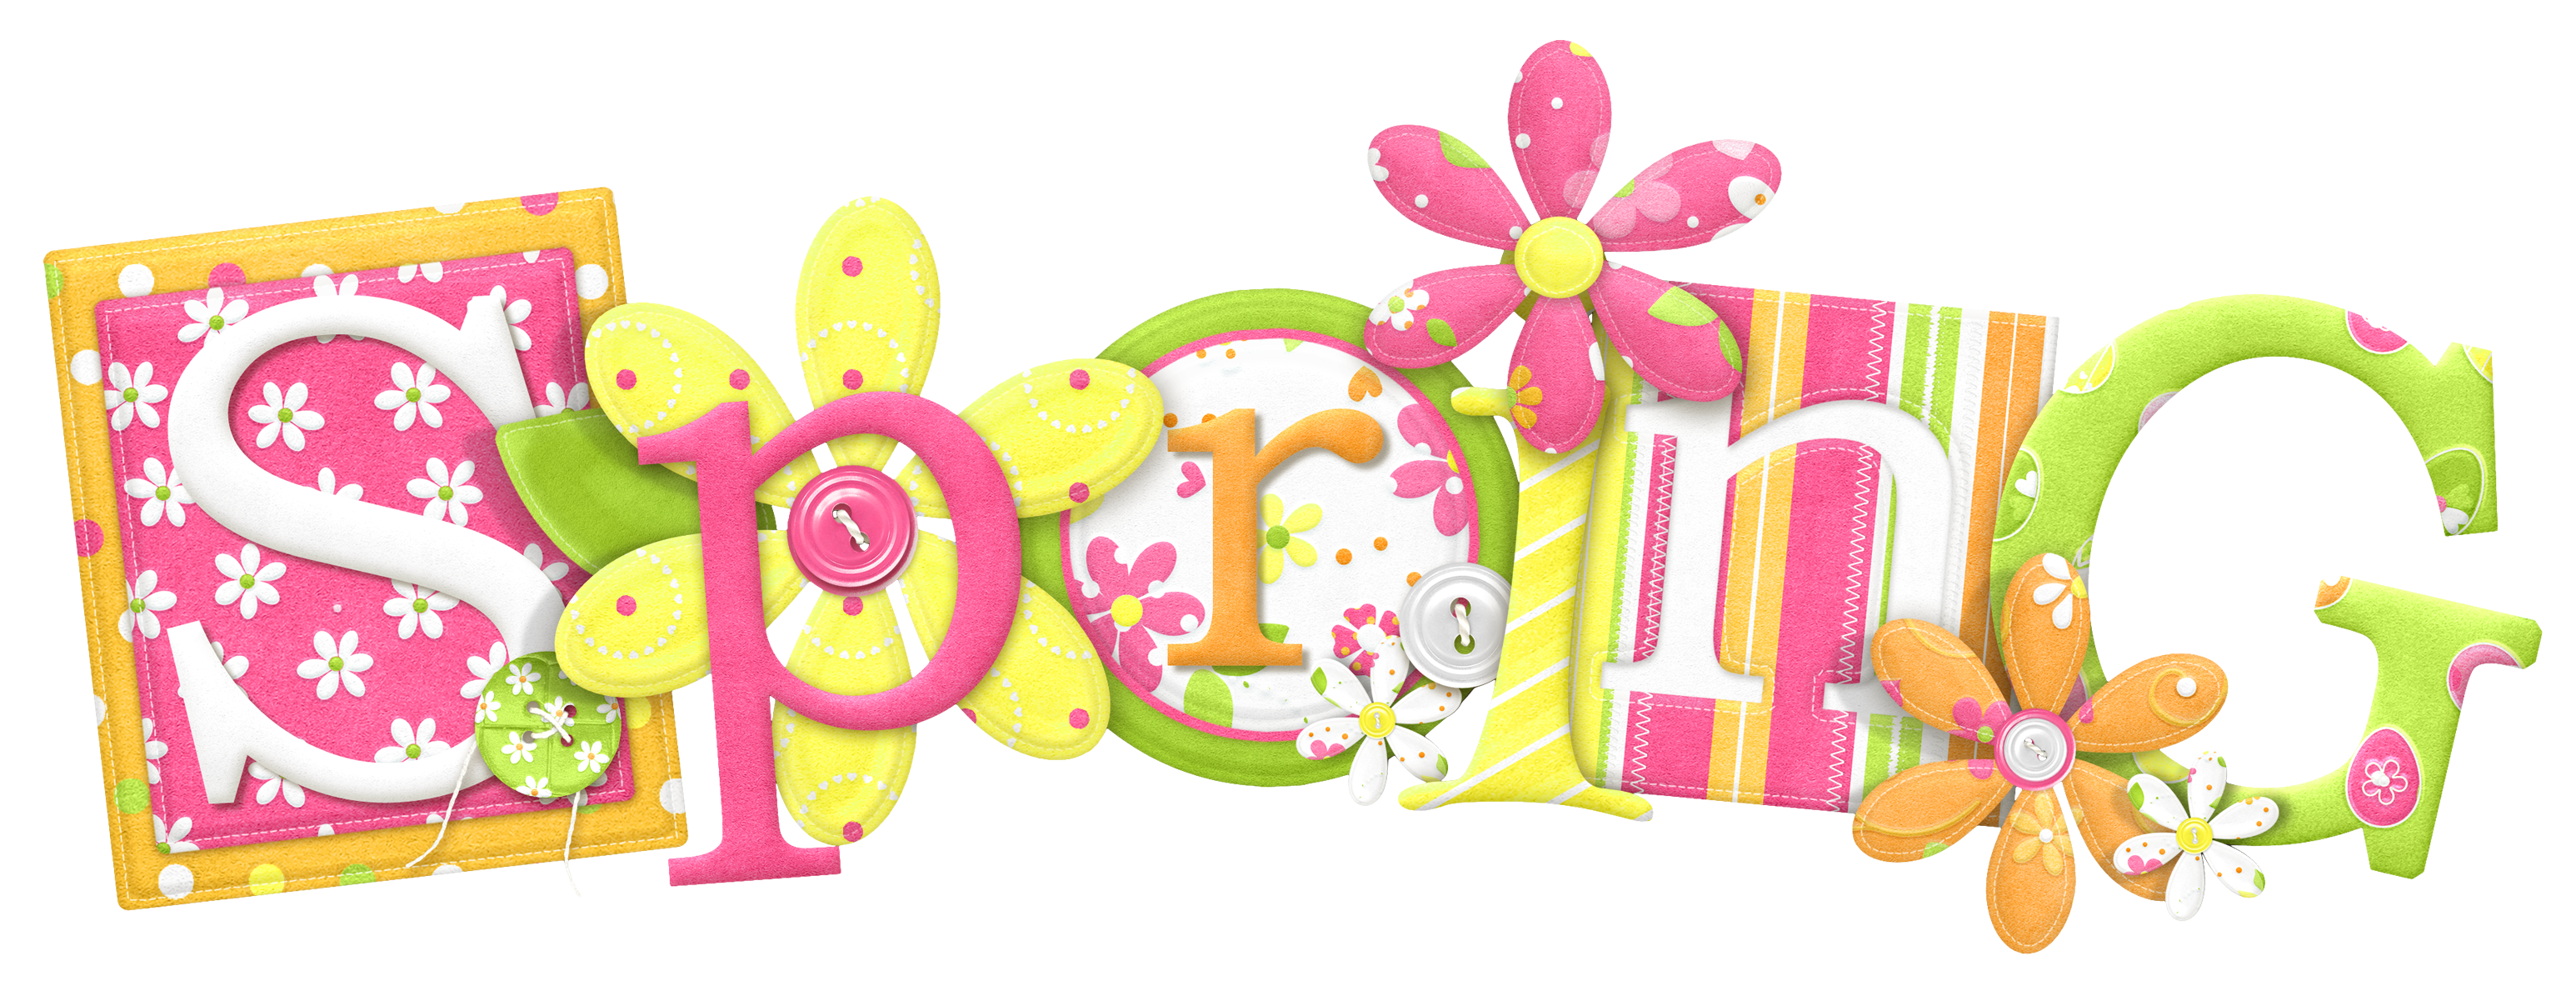 Spring clip art free clipart image 2-Spring clip art free clipart image 2-4